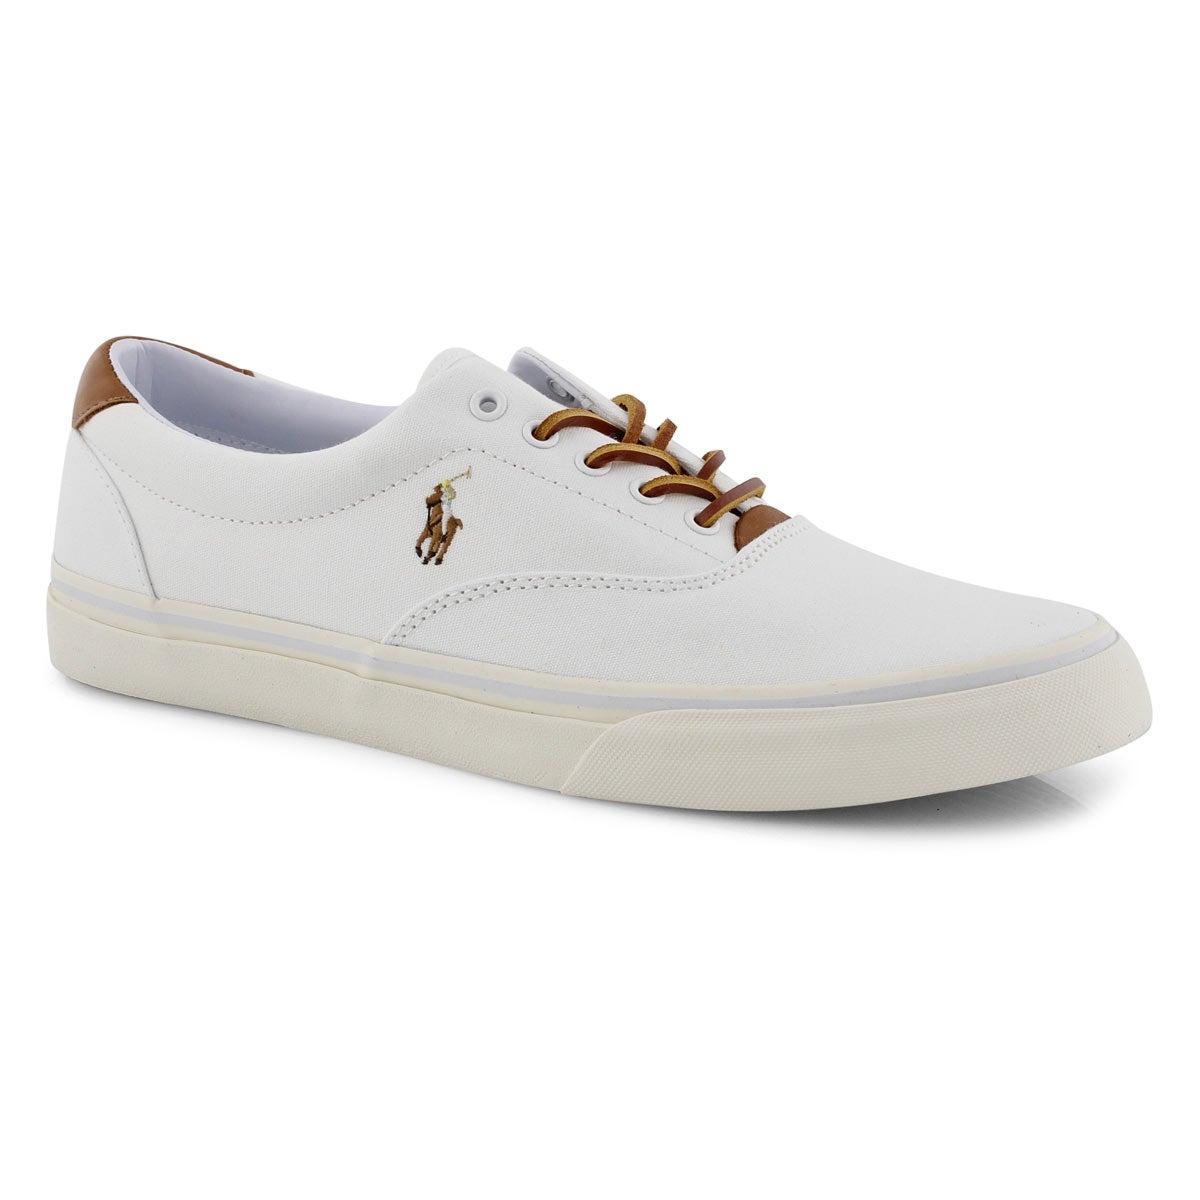 Mns Thorton white lace up sneaker